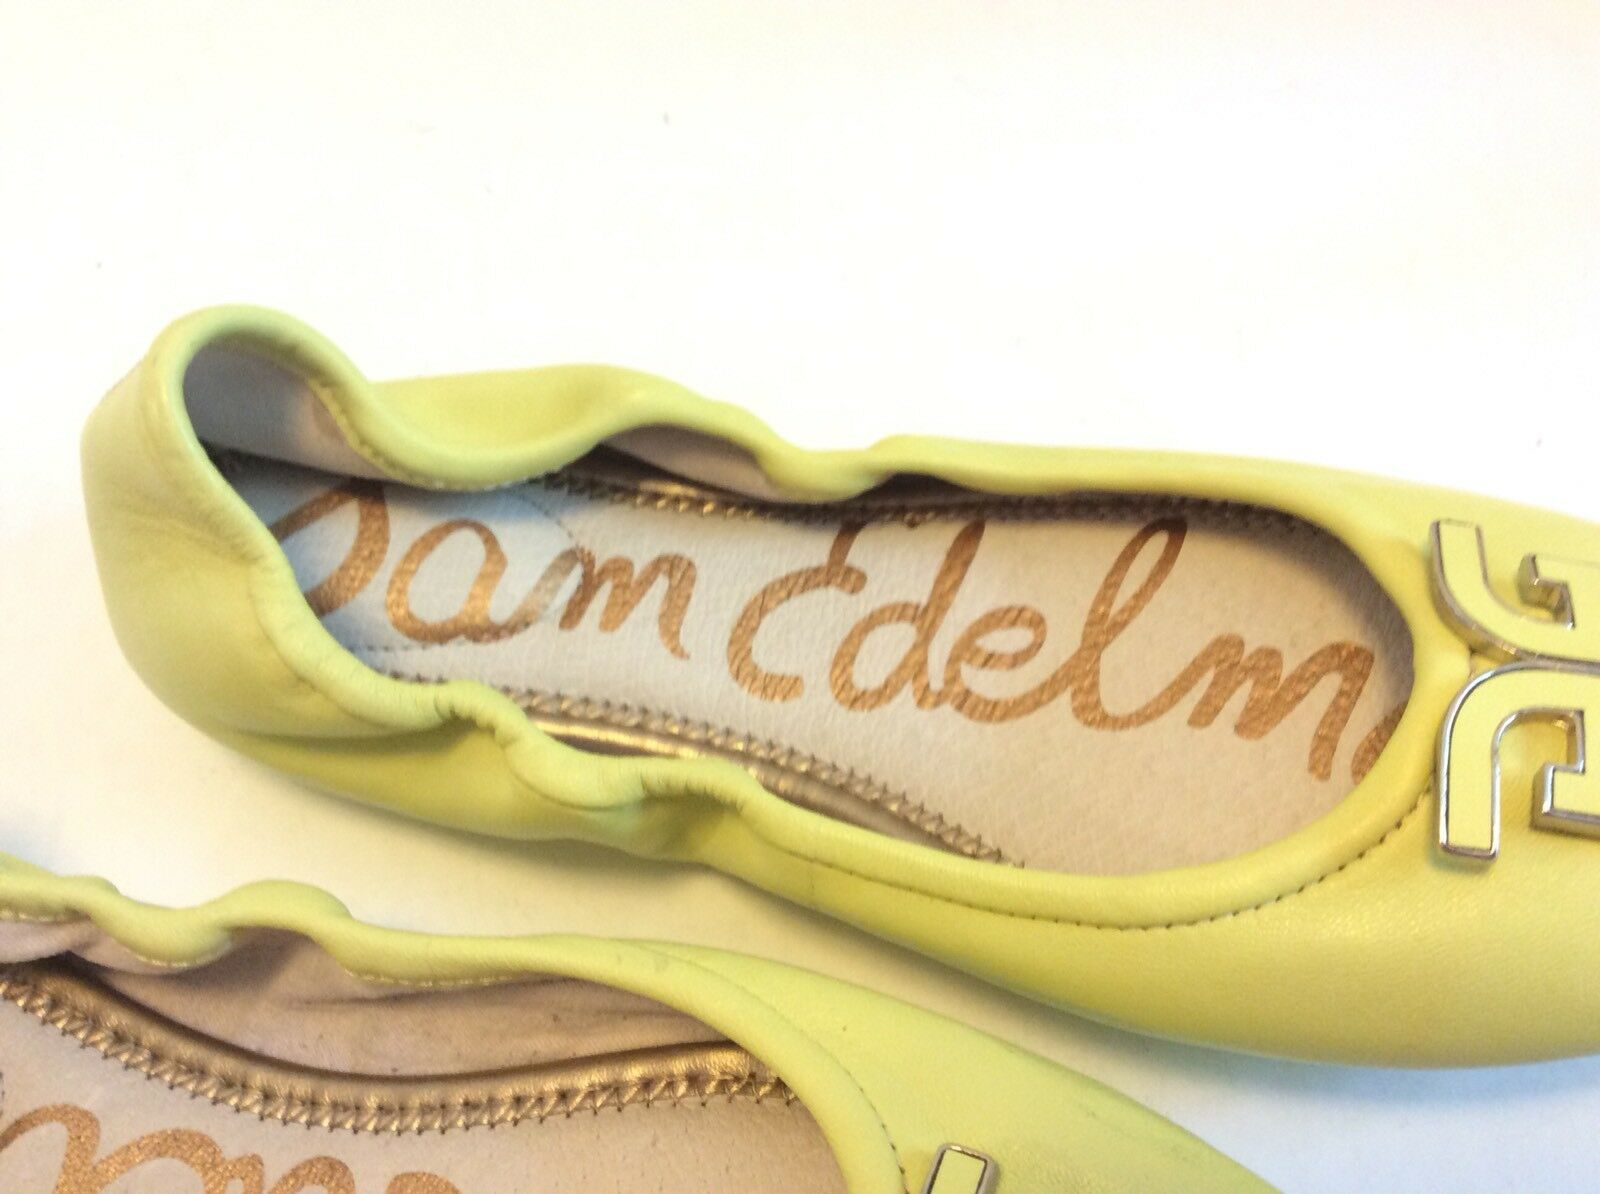 Sam Edelman Felicia Lemon Pastel Citron Yellow Pelle Ballet Ballet Ballet Flats Scarpe Taglia 6 b0ddfa